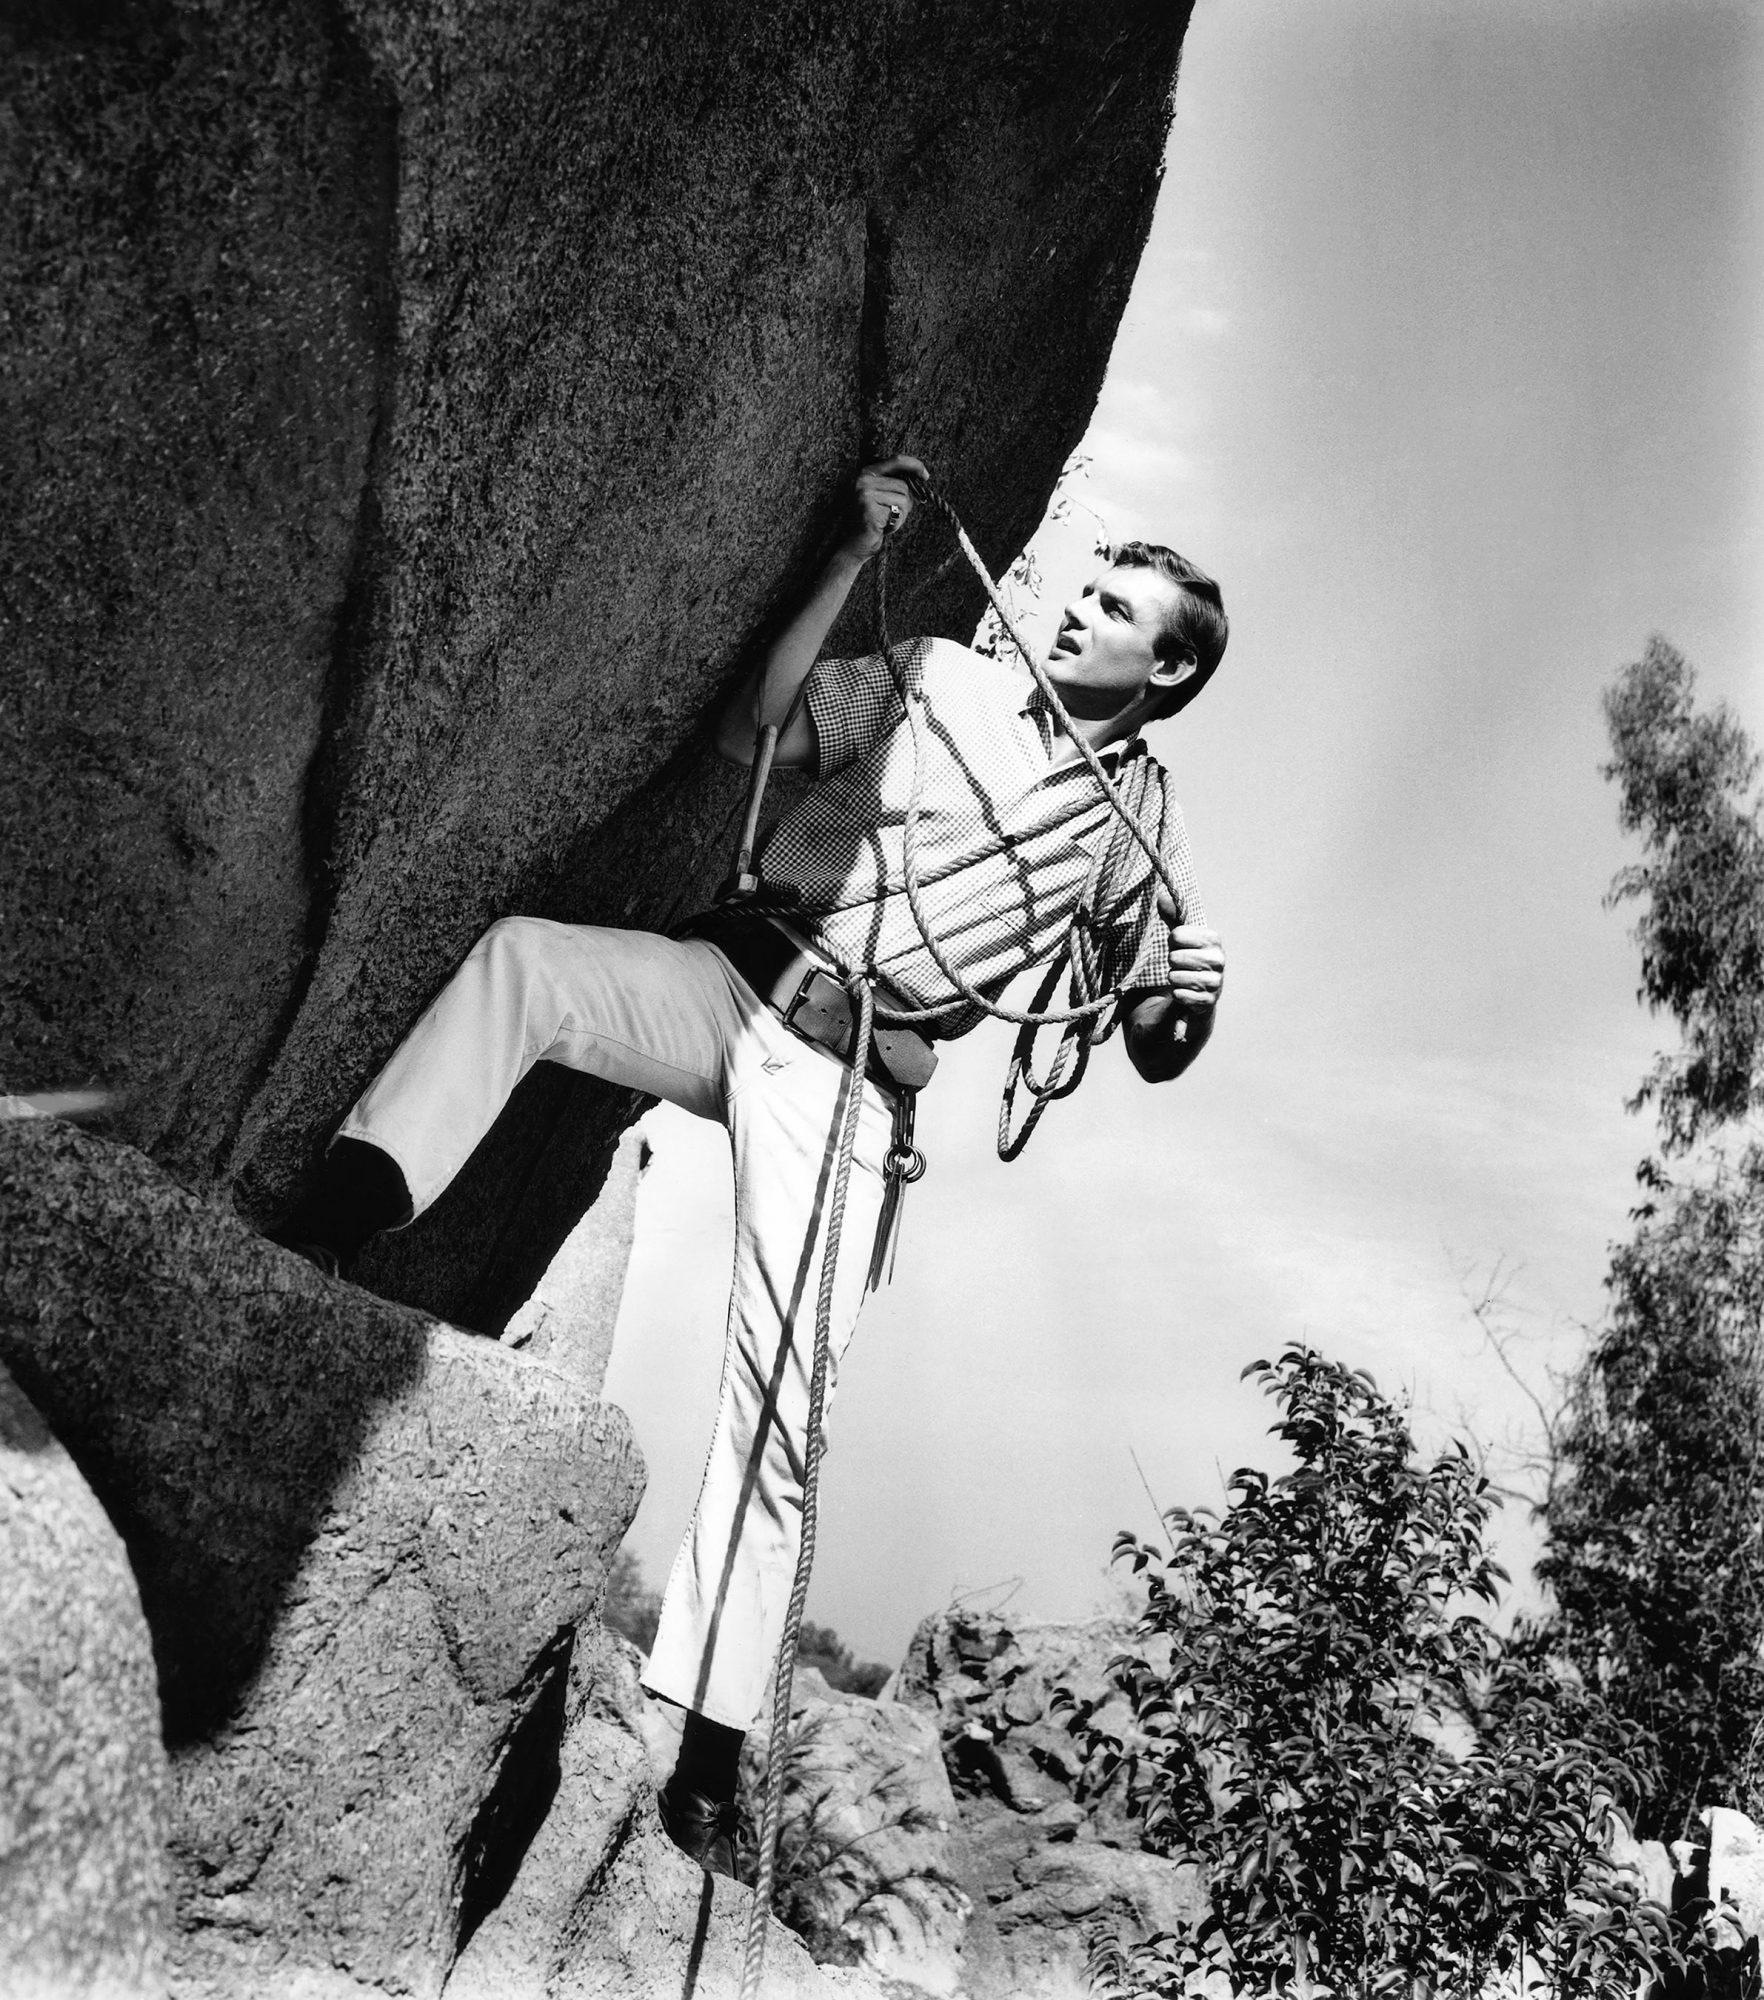 Adam West rock climbing, ca. 1961